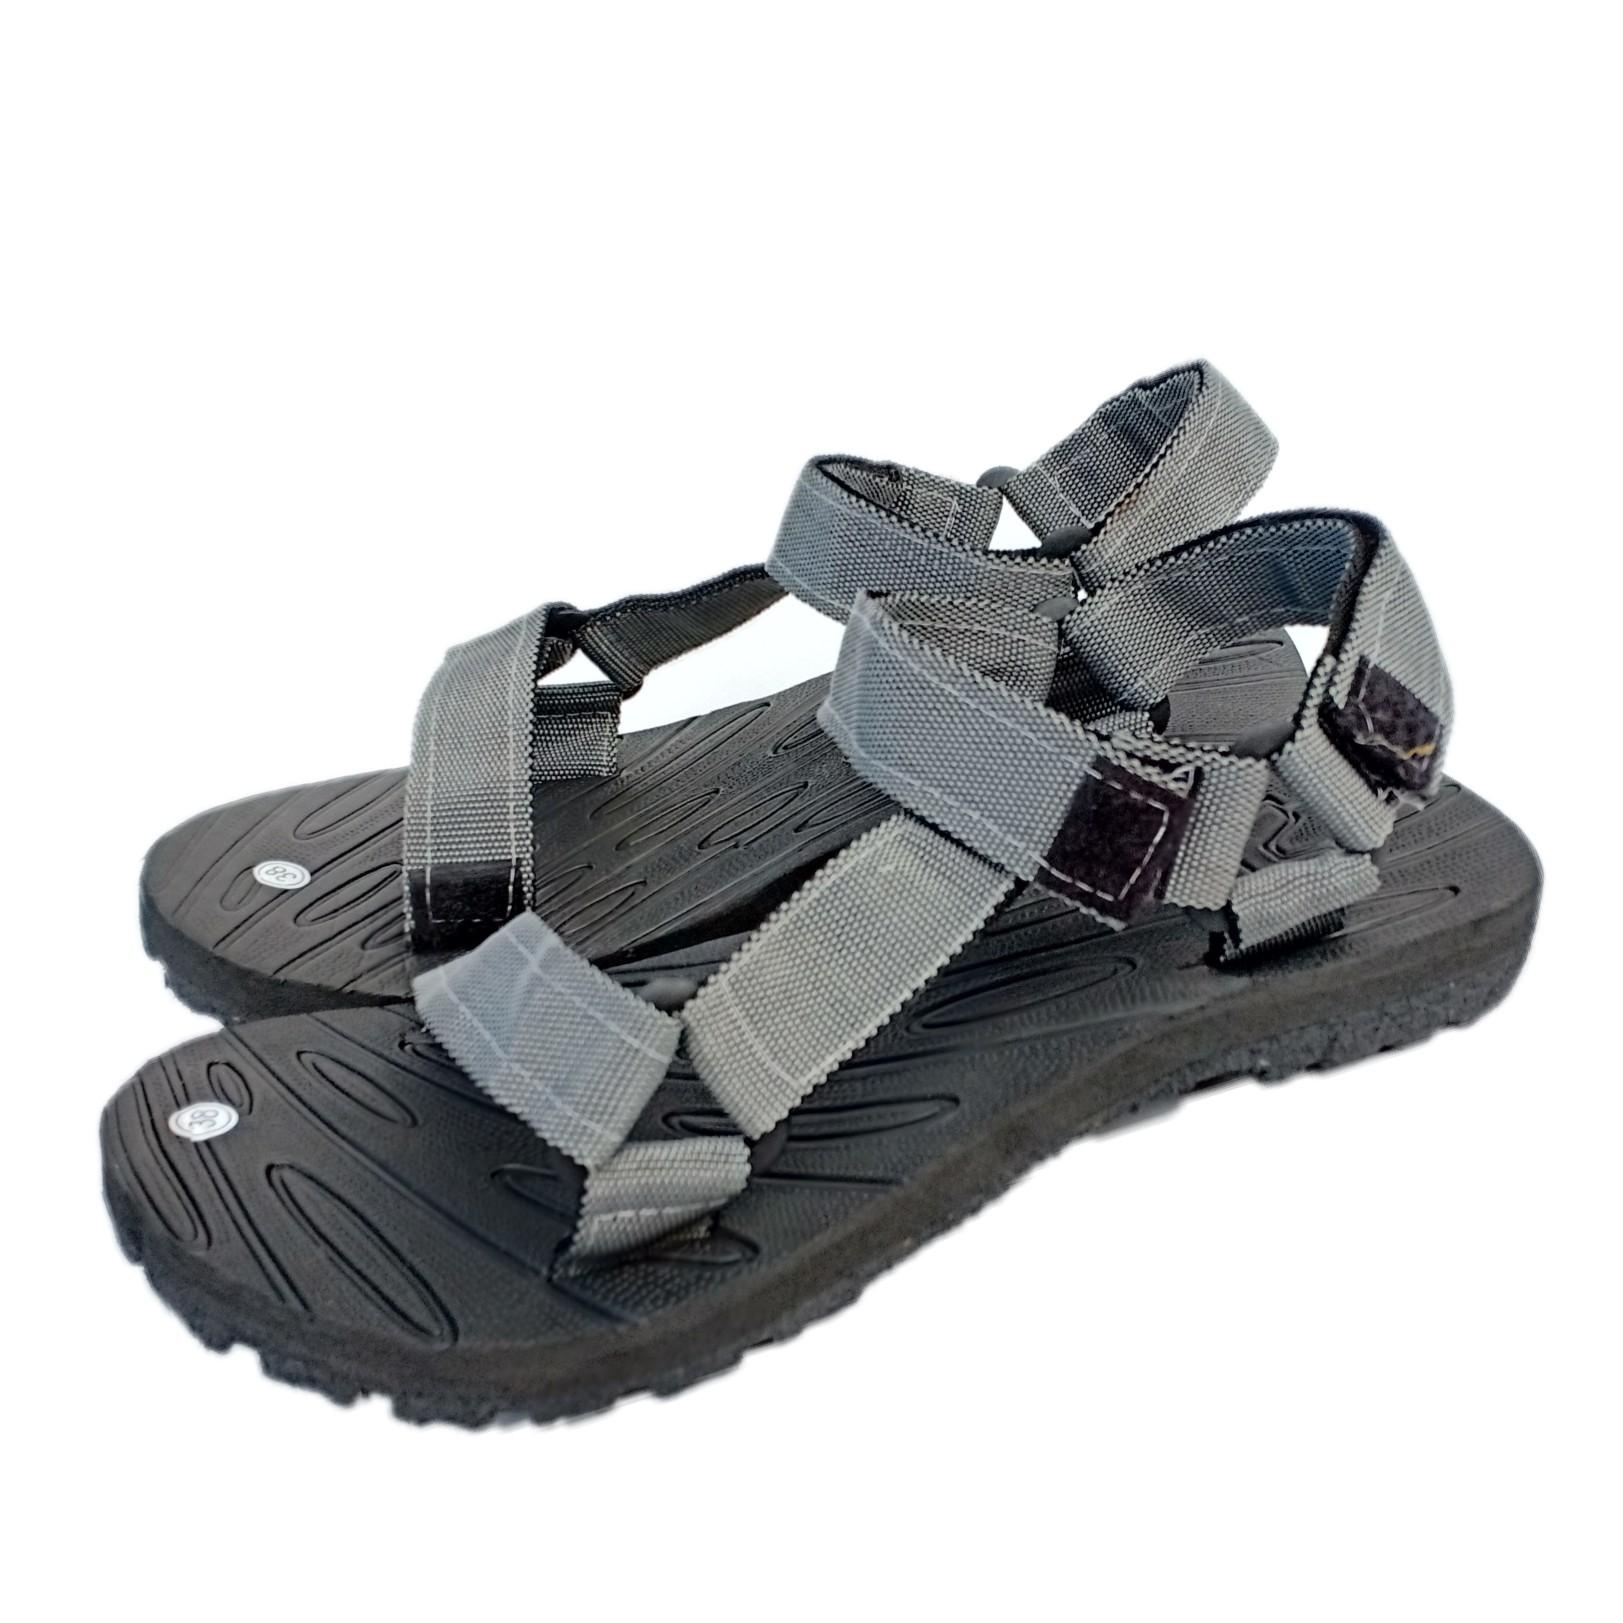 Arsy Sport Sandal Gunung / Sandal Outdoor / Sandal selop / Sandal Pria / Sandal Murah - Silfer